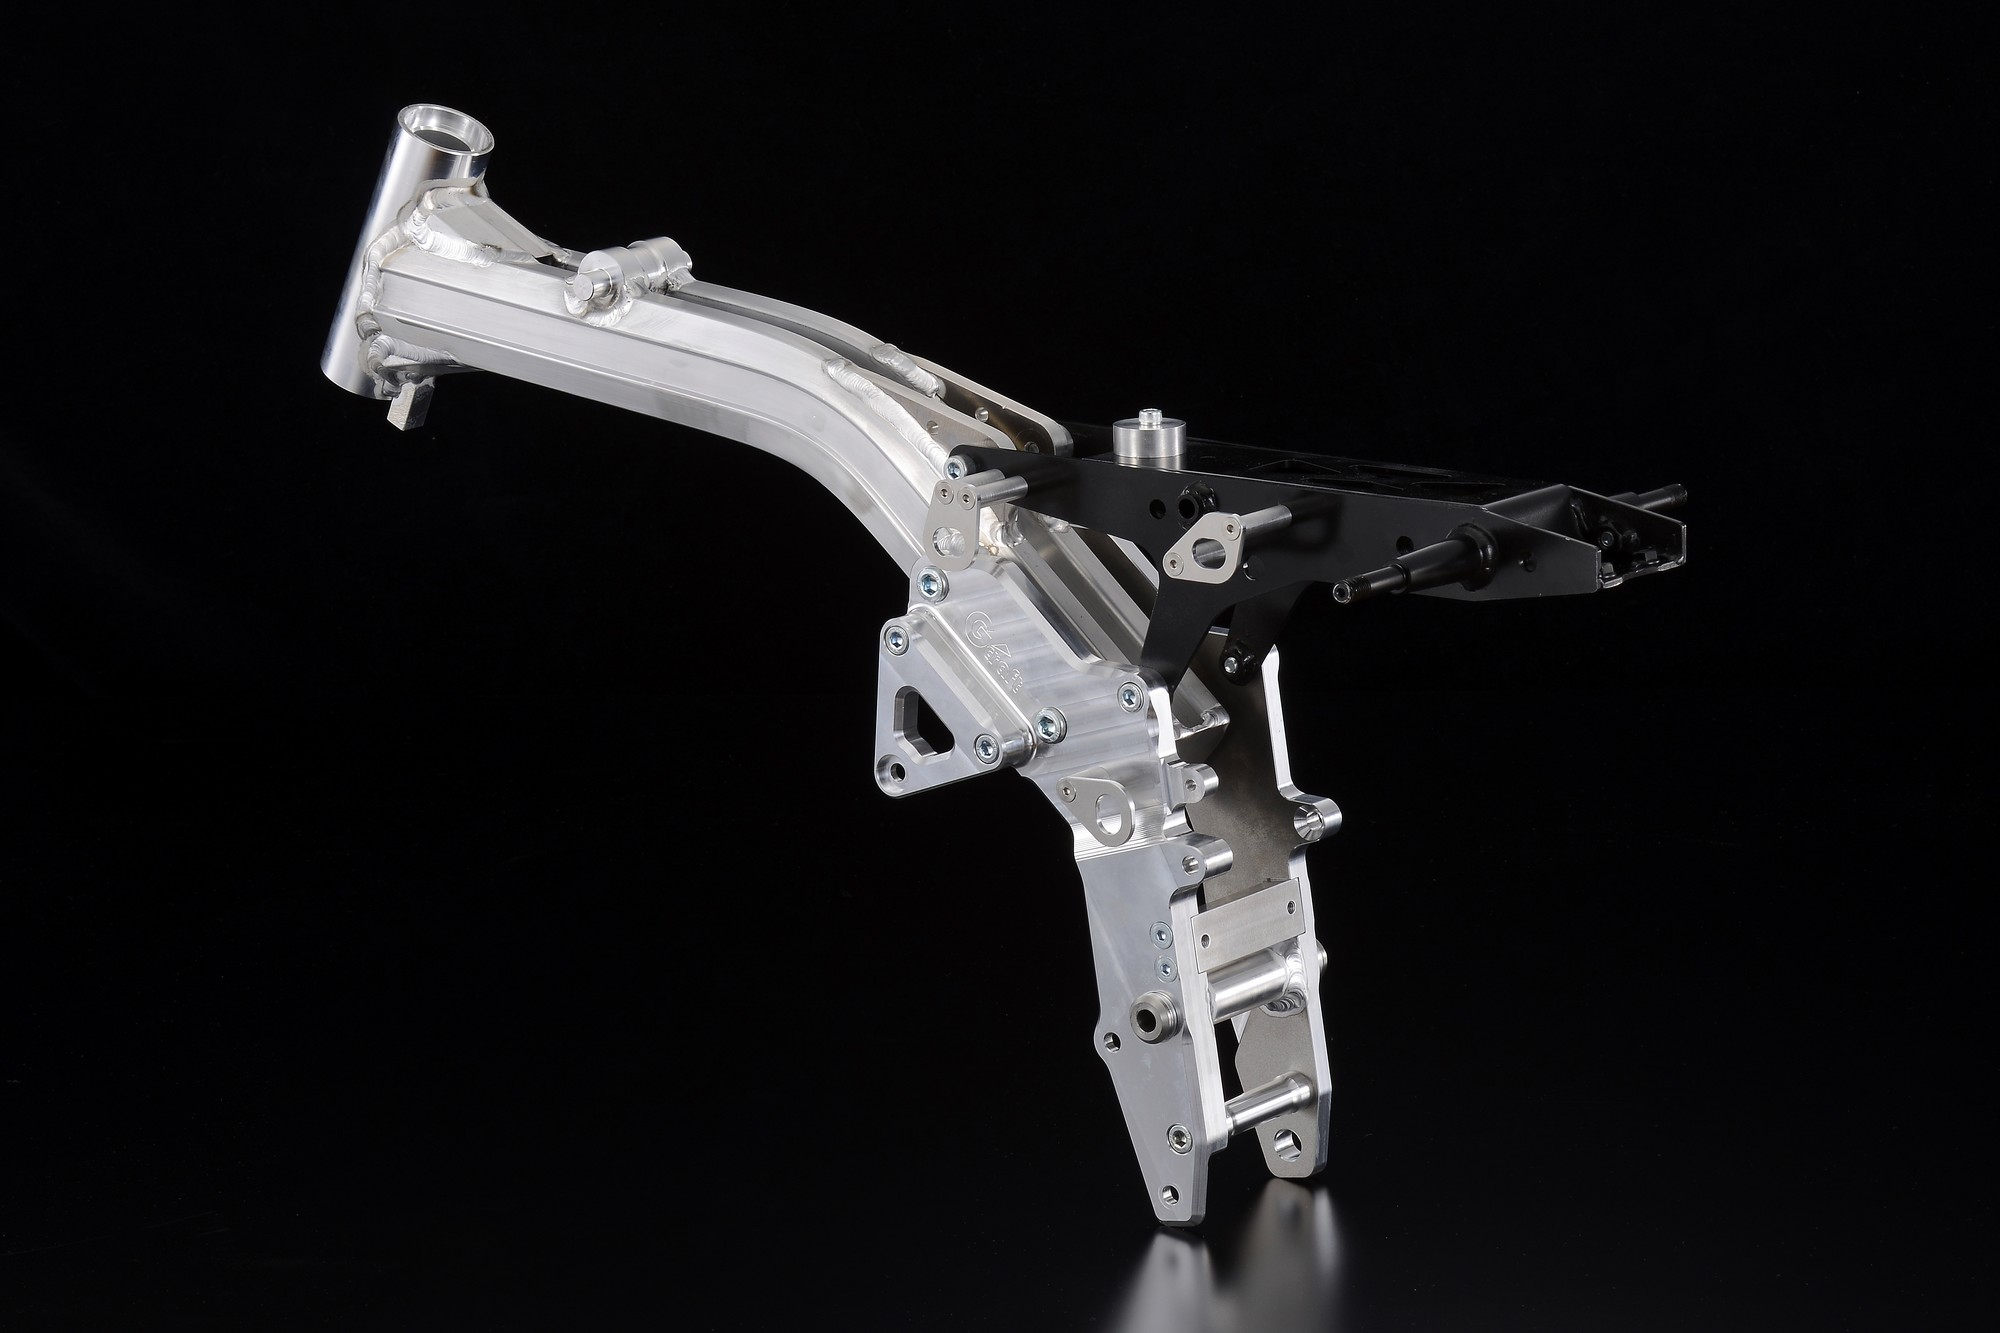 【G-Craft】GC-020 鋁合金車架 - 「Webike-摩托百貨」